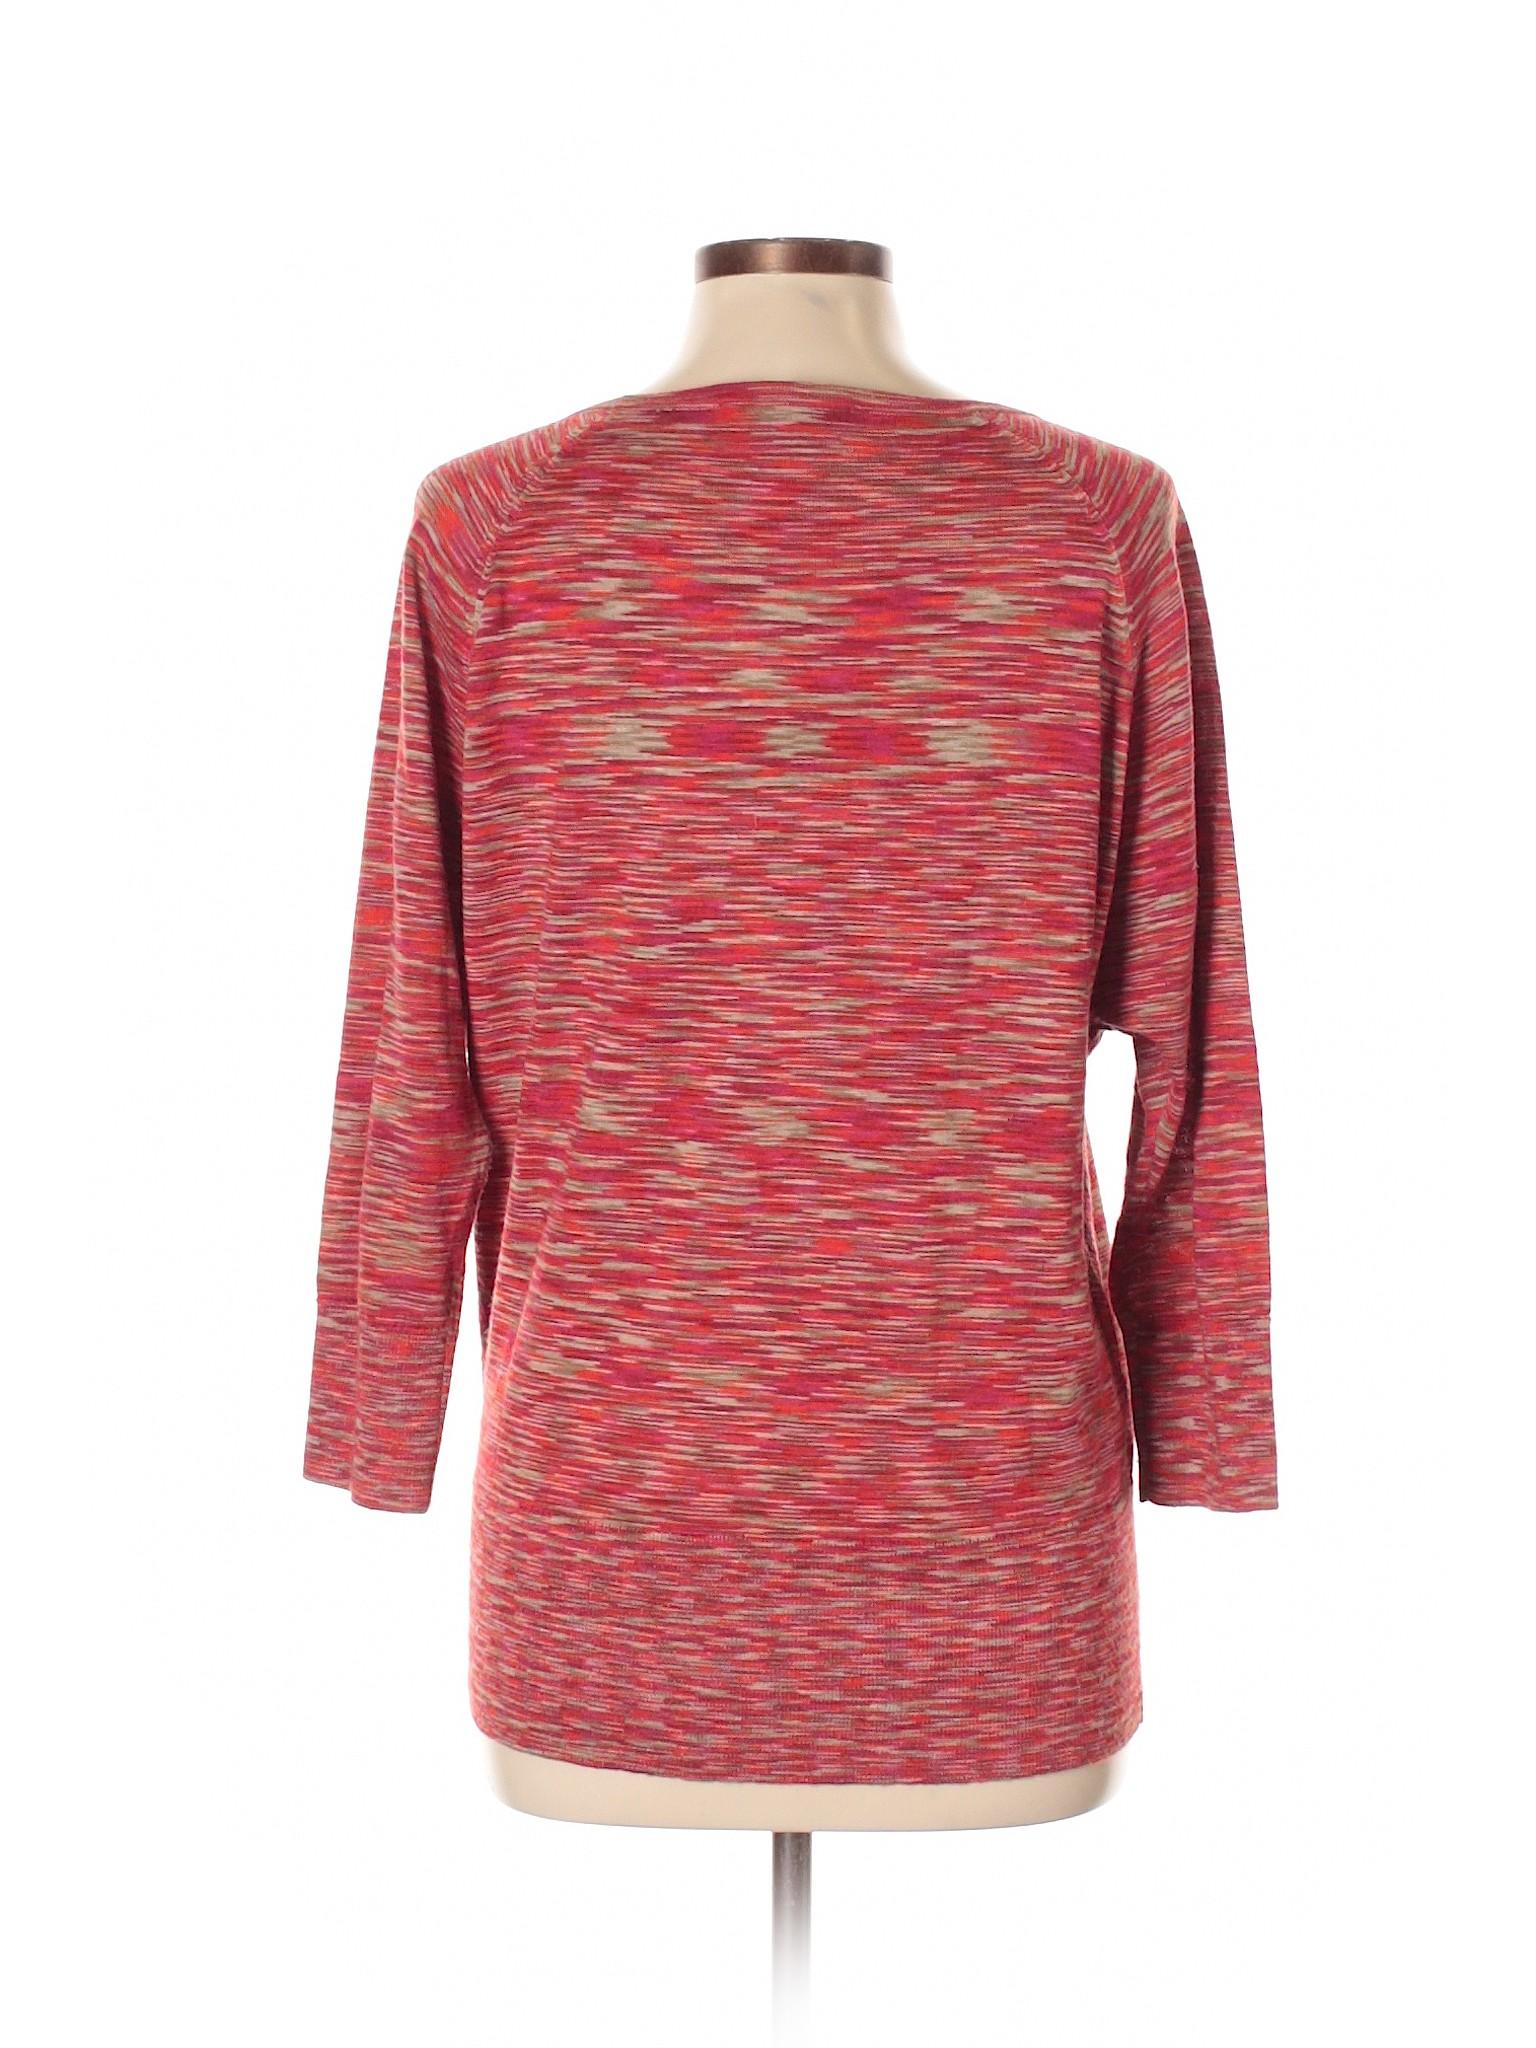 Sweater Taylor Boutique LOFT Ann Pullover 8W4naqOnP